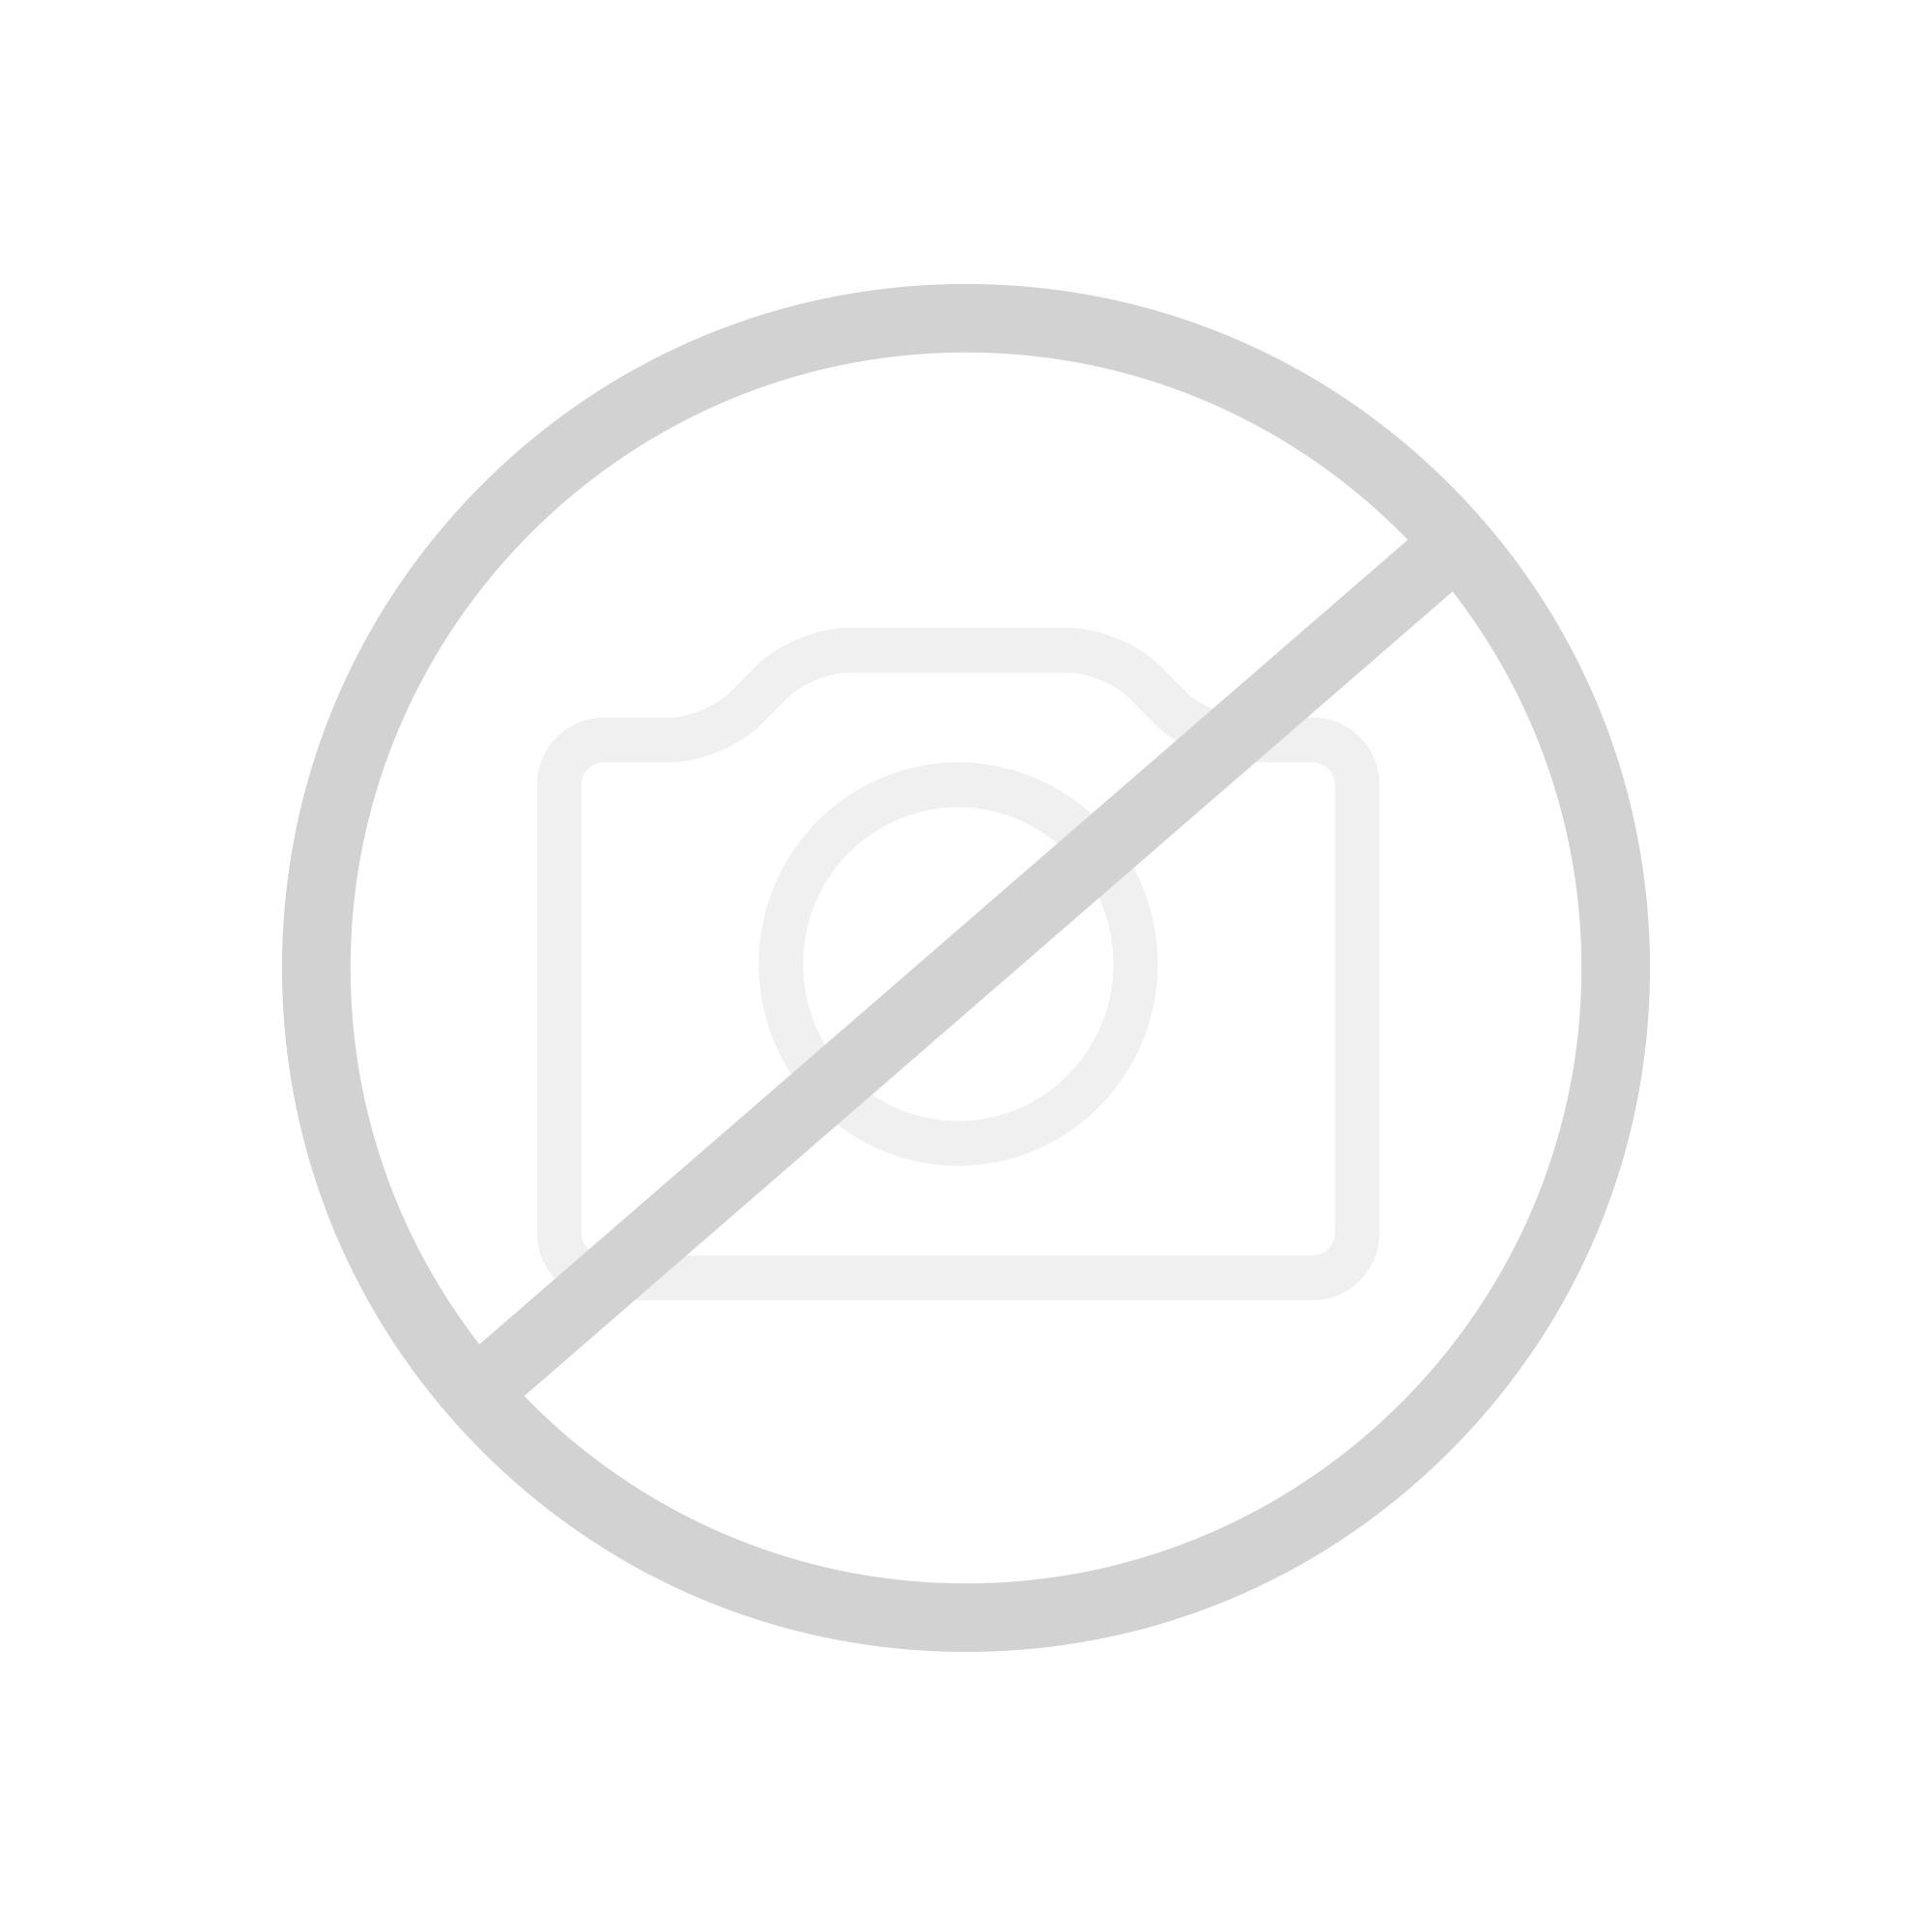 keuco edition 11 seifenablage f r wandmontage 11155019000 reuter. Black Bedroom Furniture Sets. Home Design Ideas